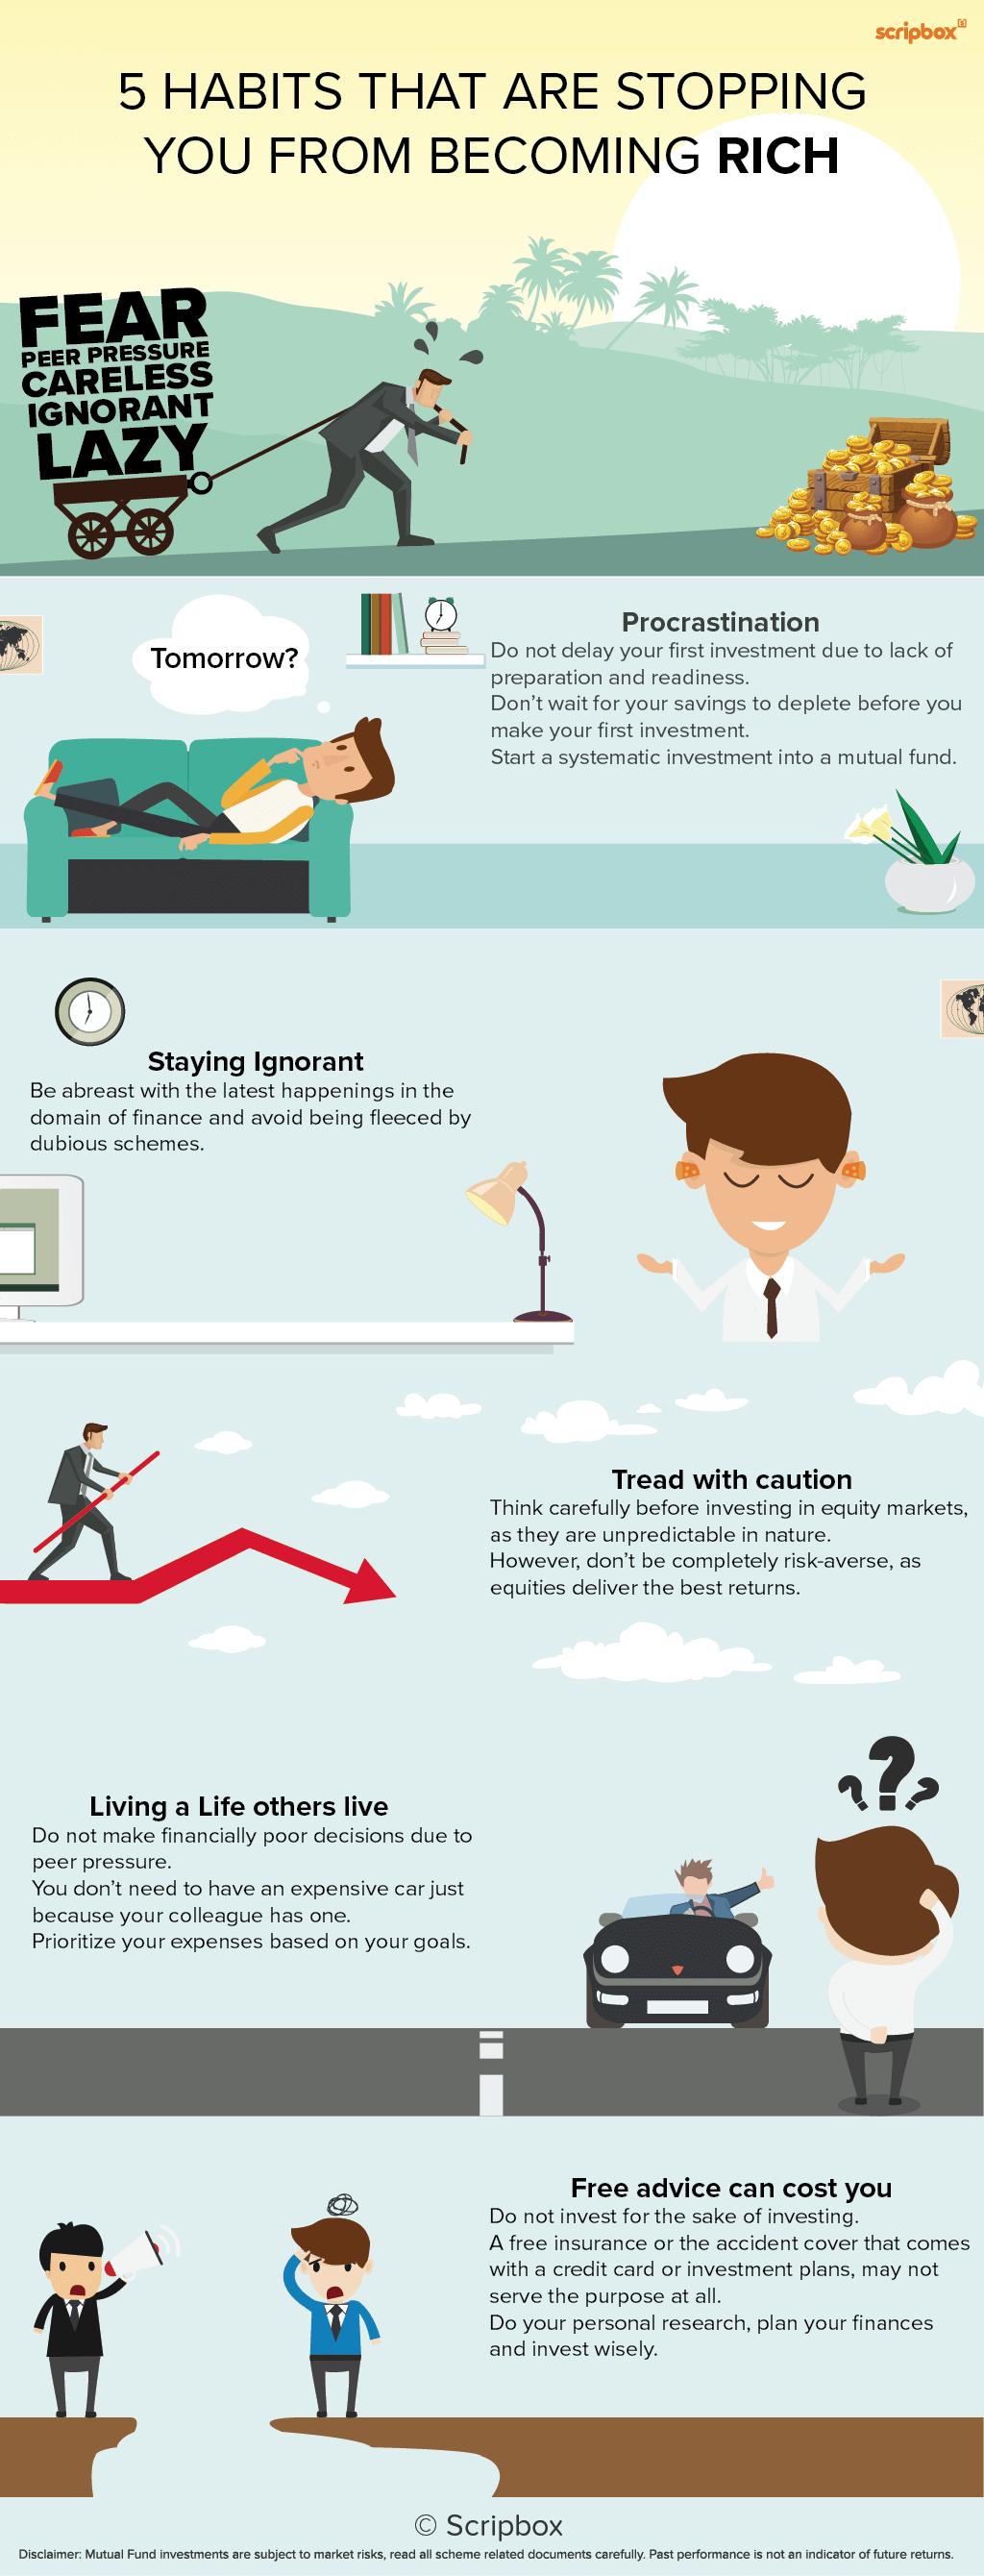 5 habits rich for publishing